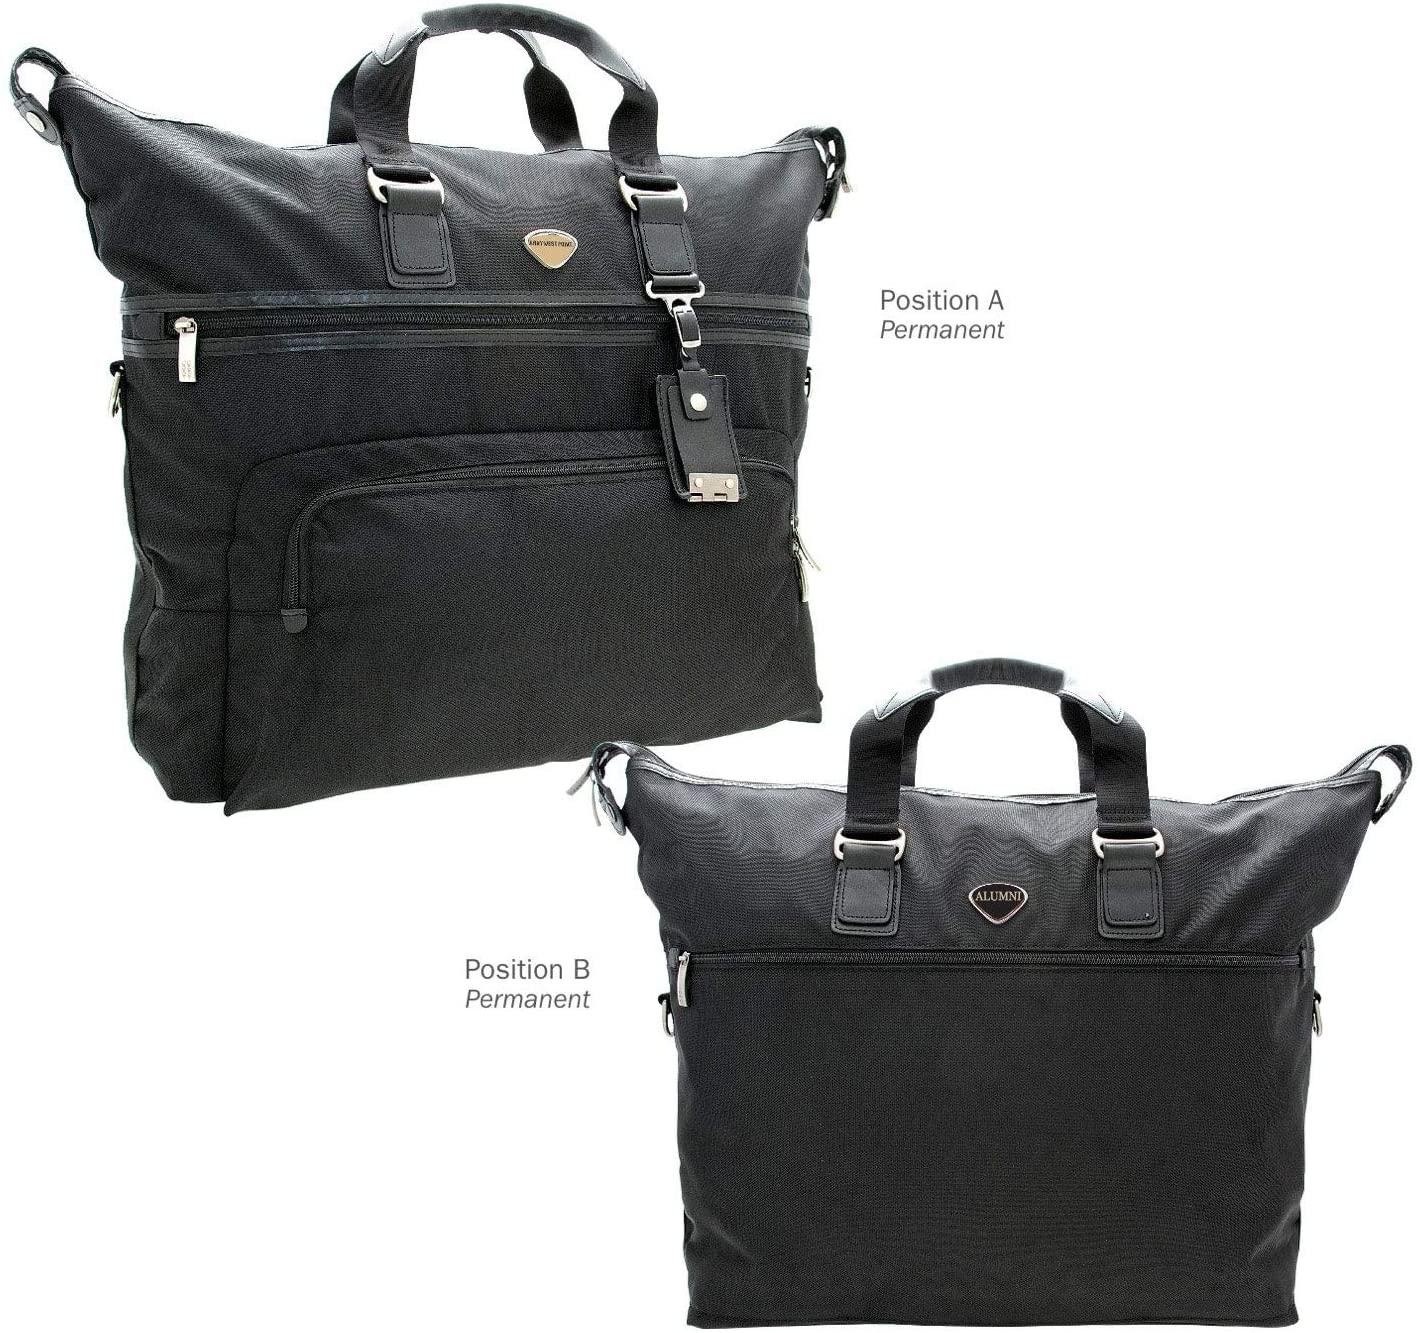 NCAA United States Military Academy Collegiate Executive Weekender Duffel BagCollegiate Executive Weekender Duffel Bag, Black, One Size